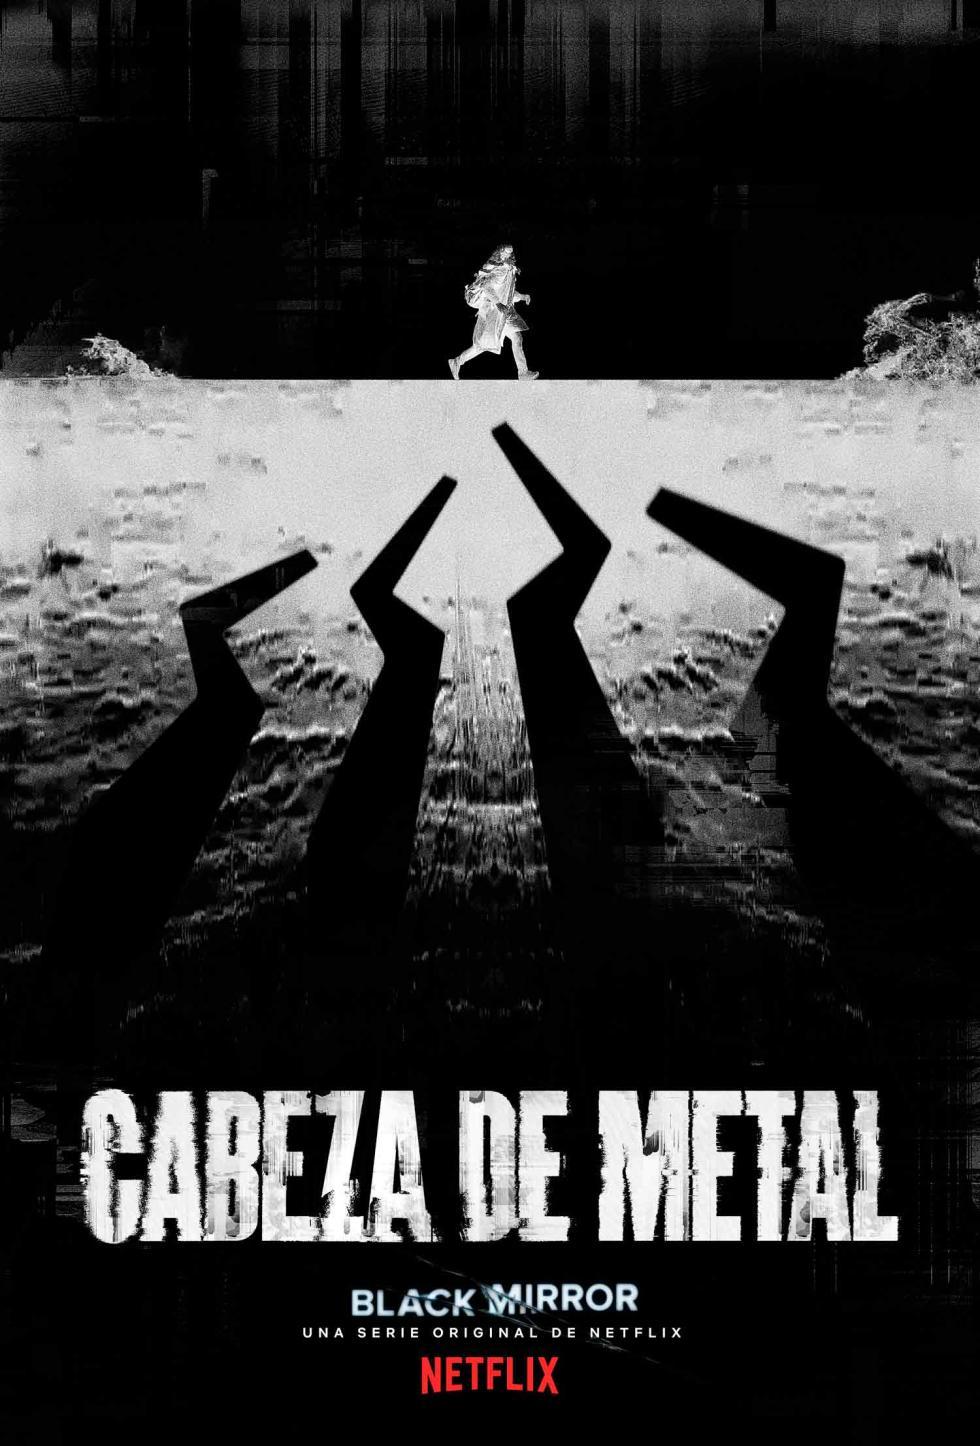 Cartel de Cabeza de Metal